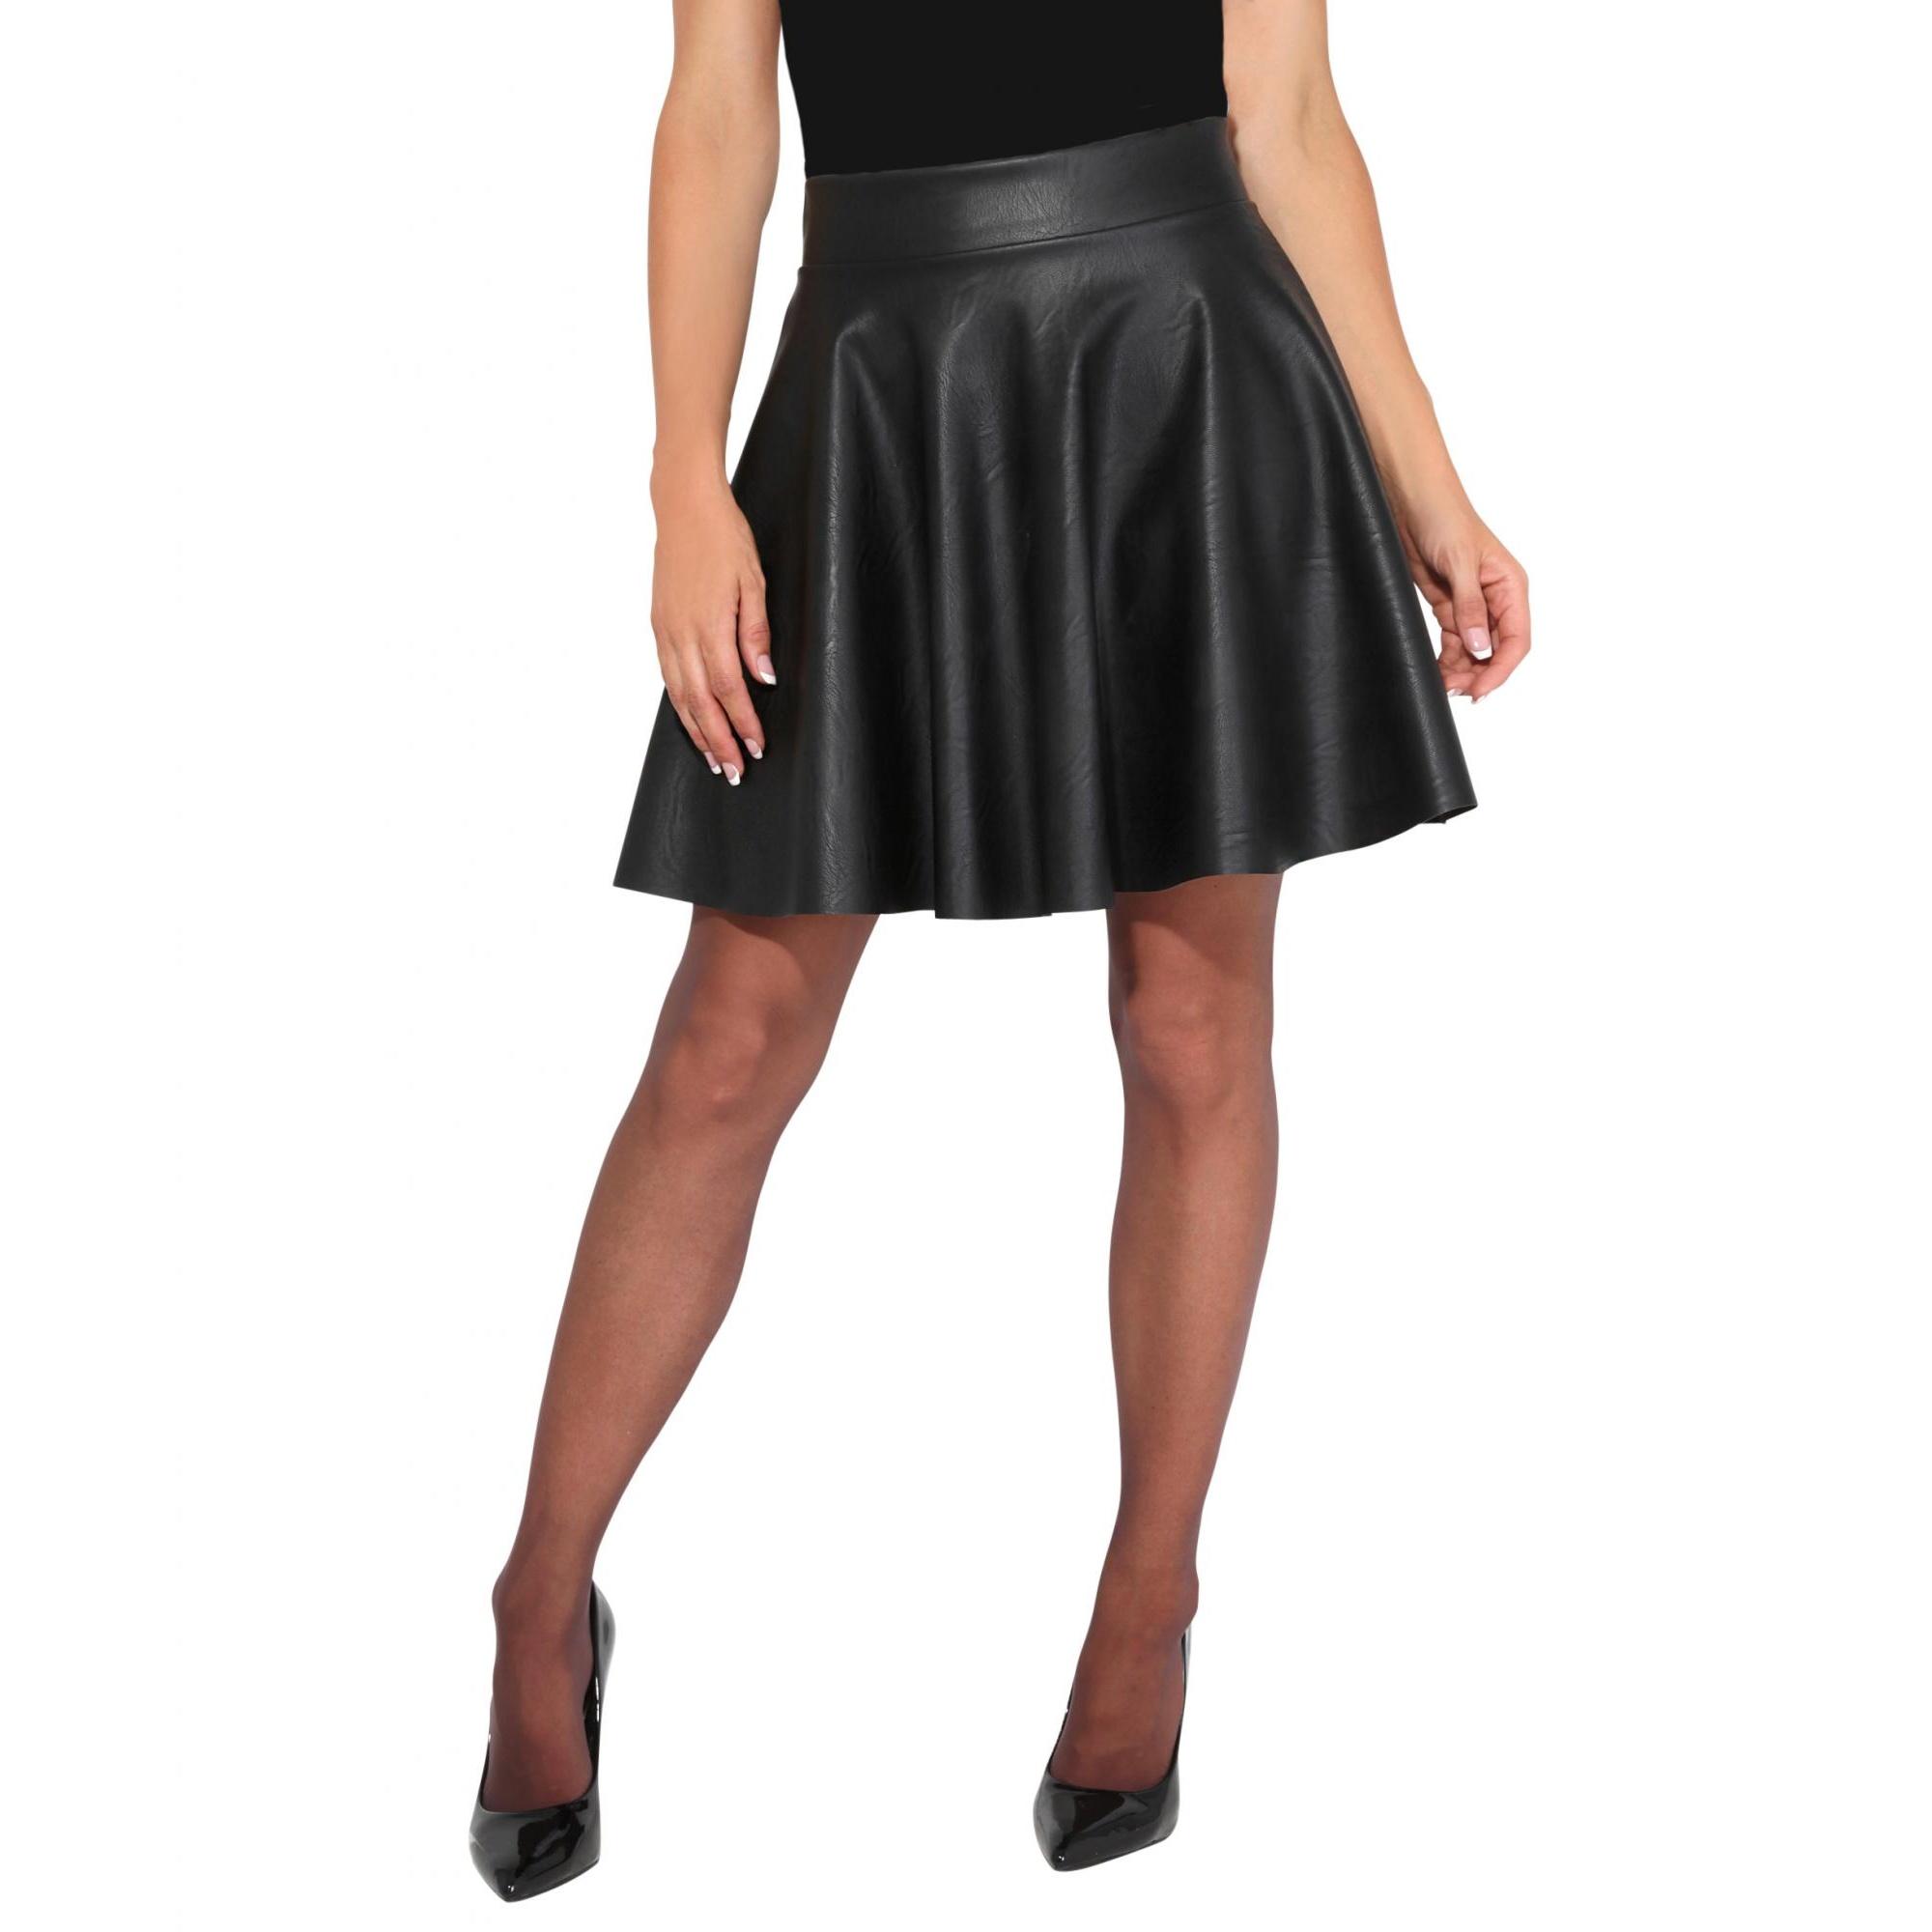 Krisp Womens/Ladies Faux Leather Skater Mini Skirt (8 UK) (Black)